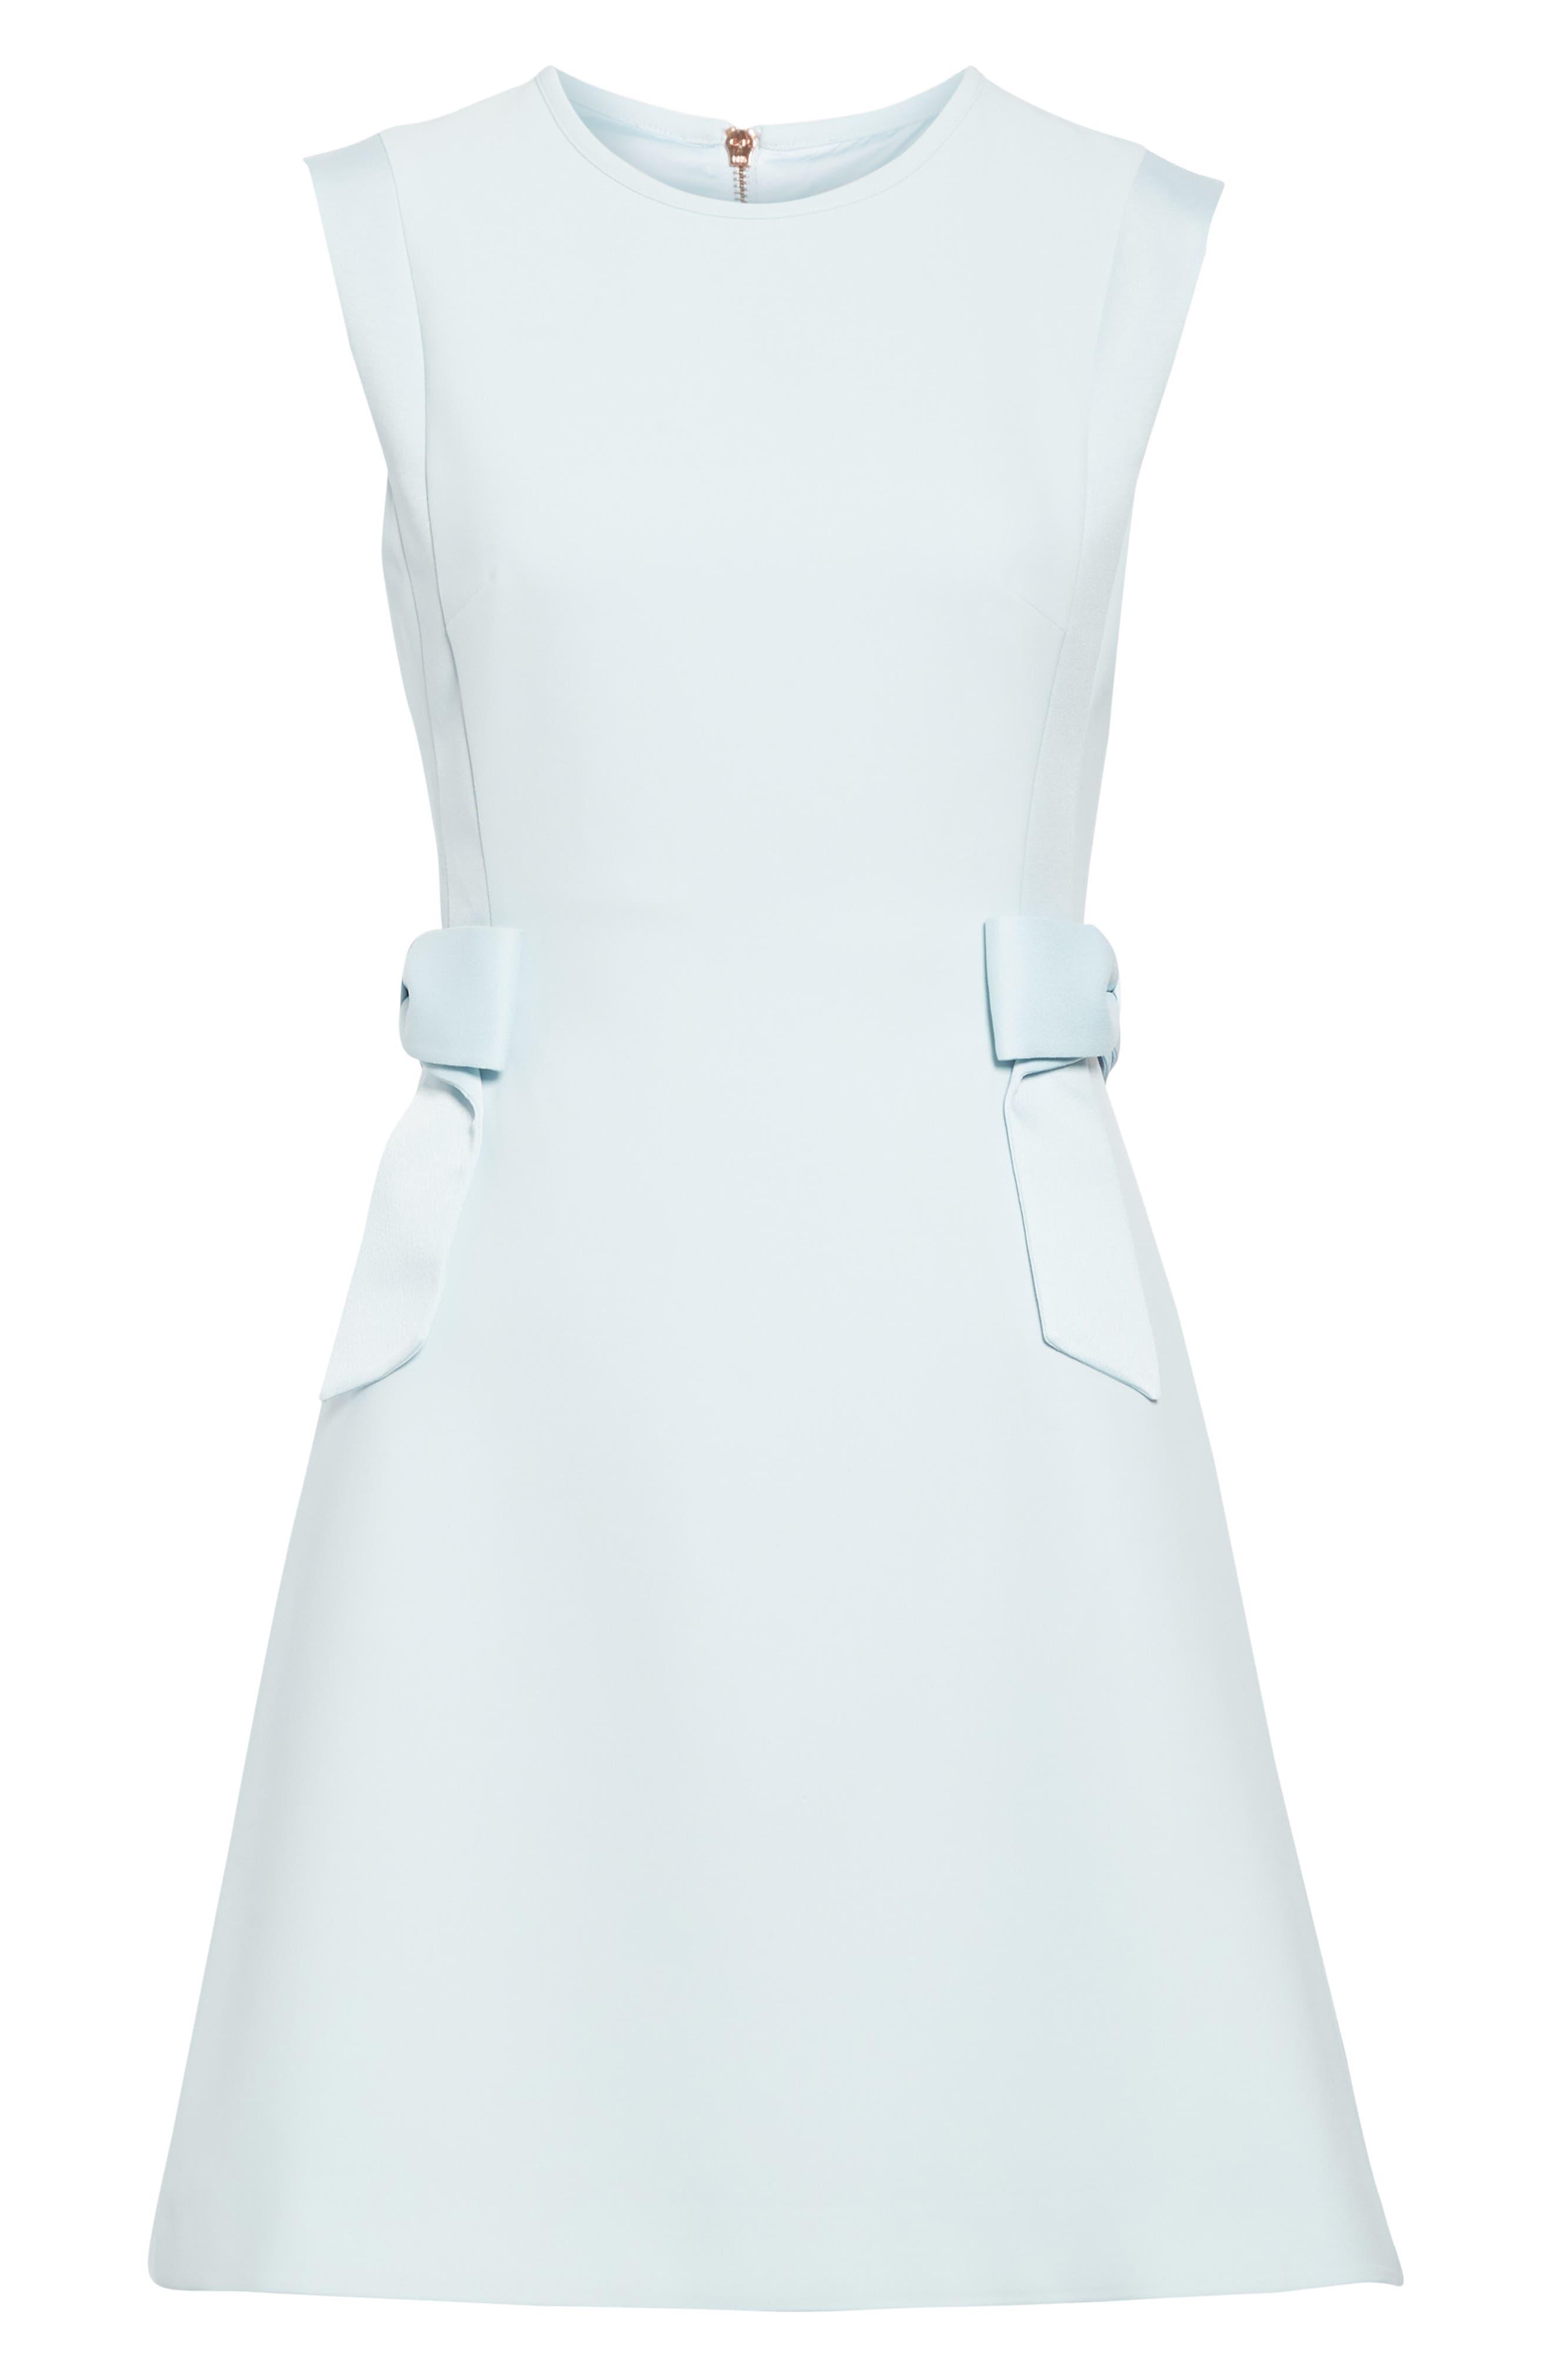 TED BAKER LONDON, Meline Side Bow Detail Dress, Alternate thumbnail 7, color, MINT